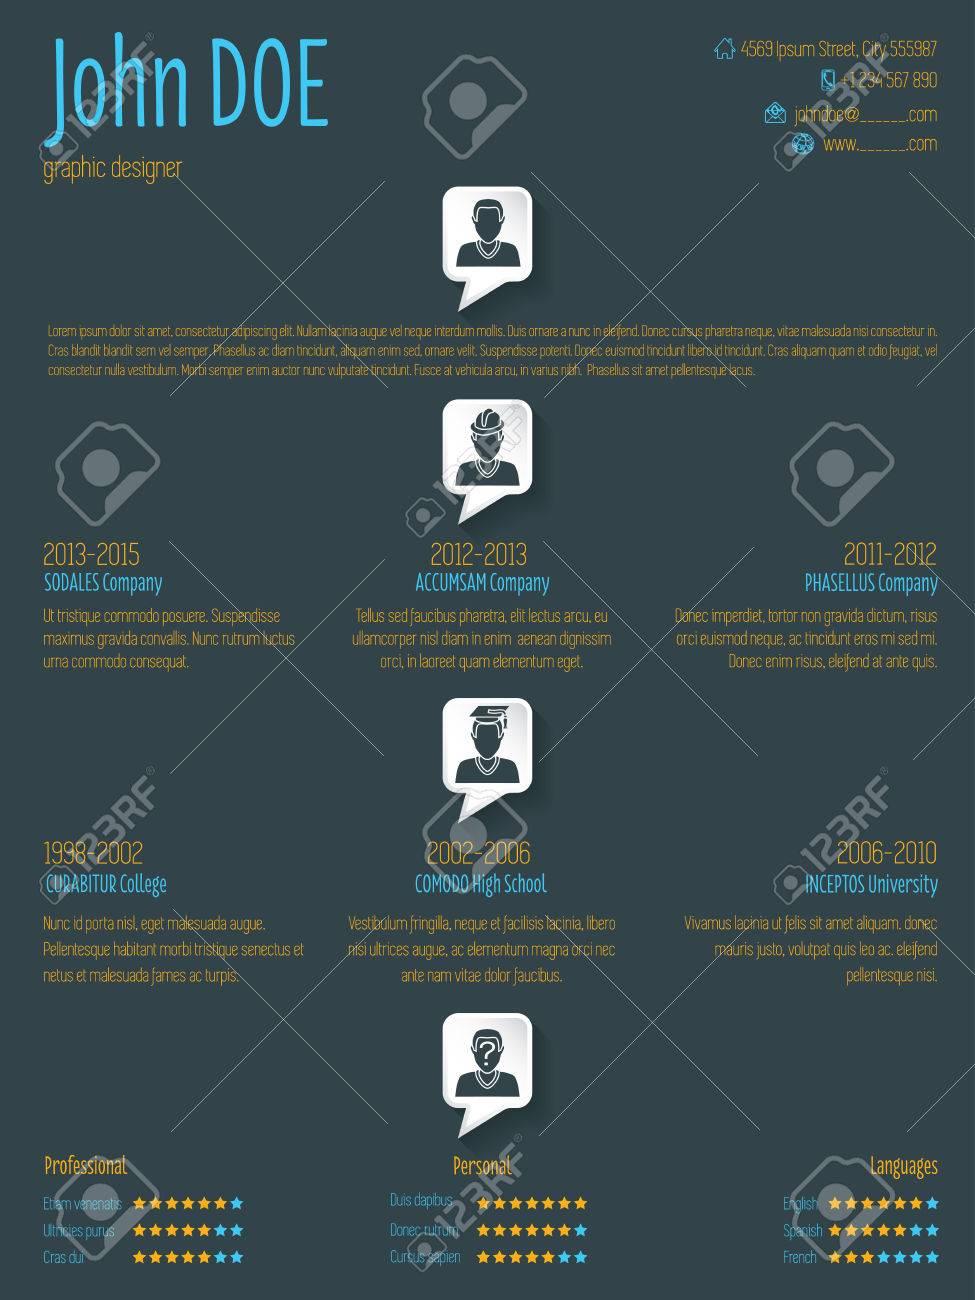 Cool Resume Cv Curriculum Vitae Template Design With Speech Bubbles